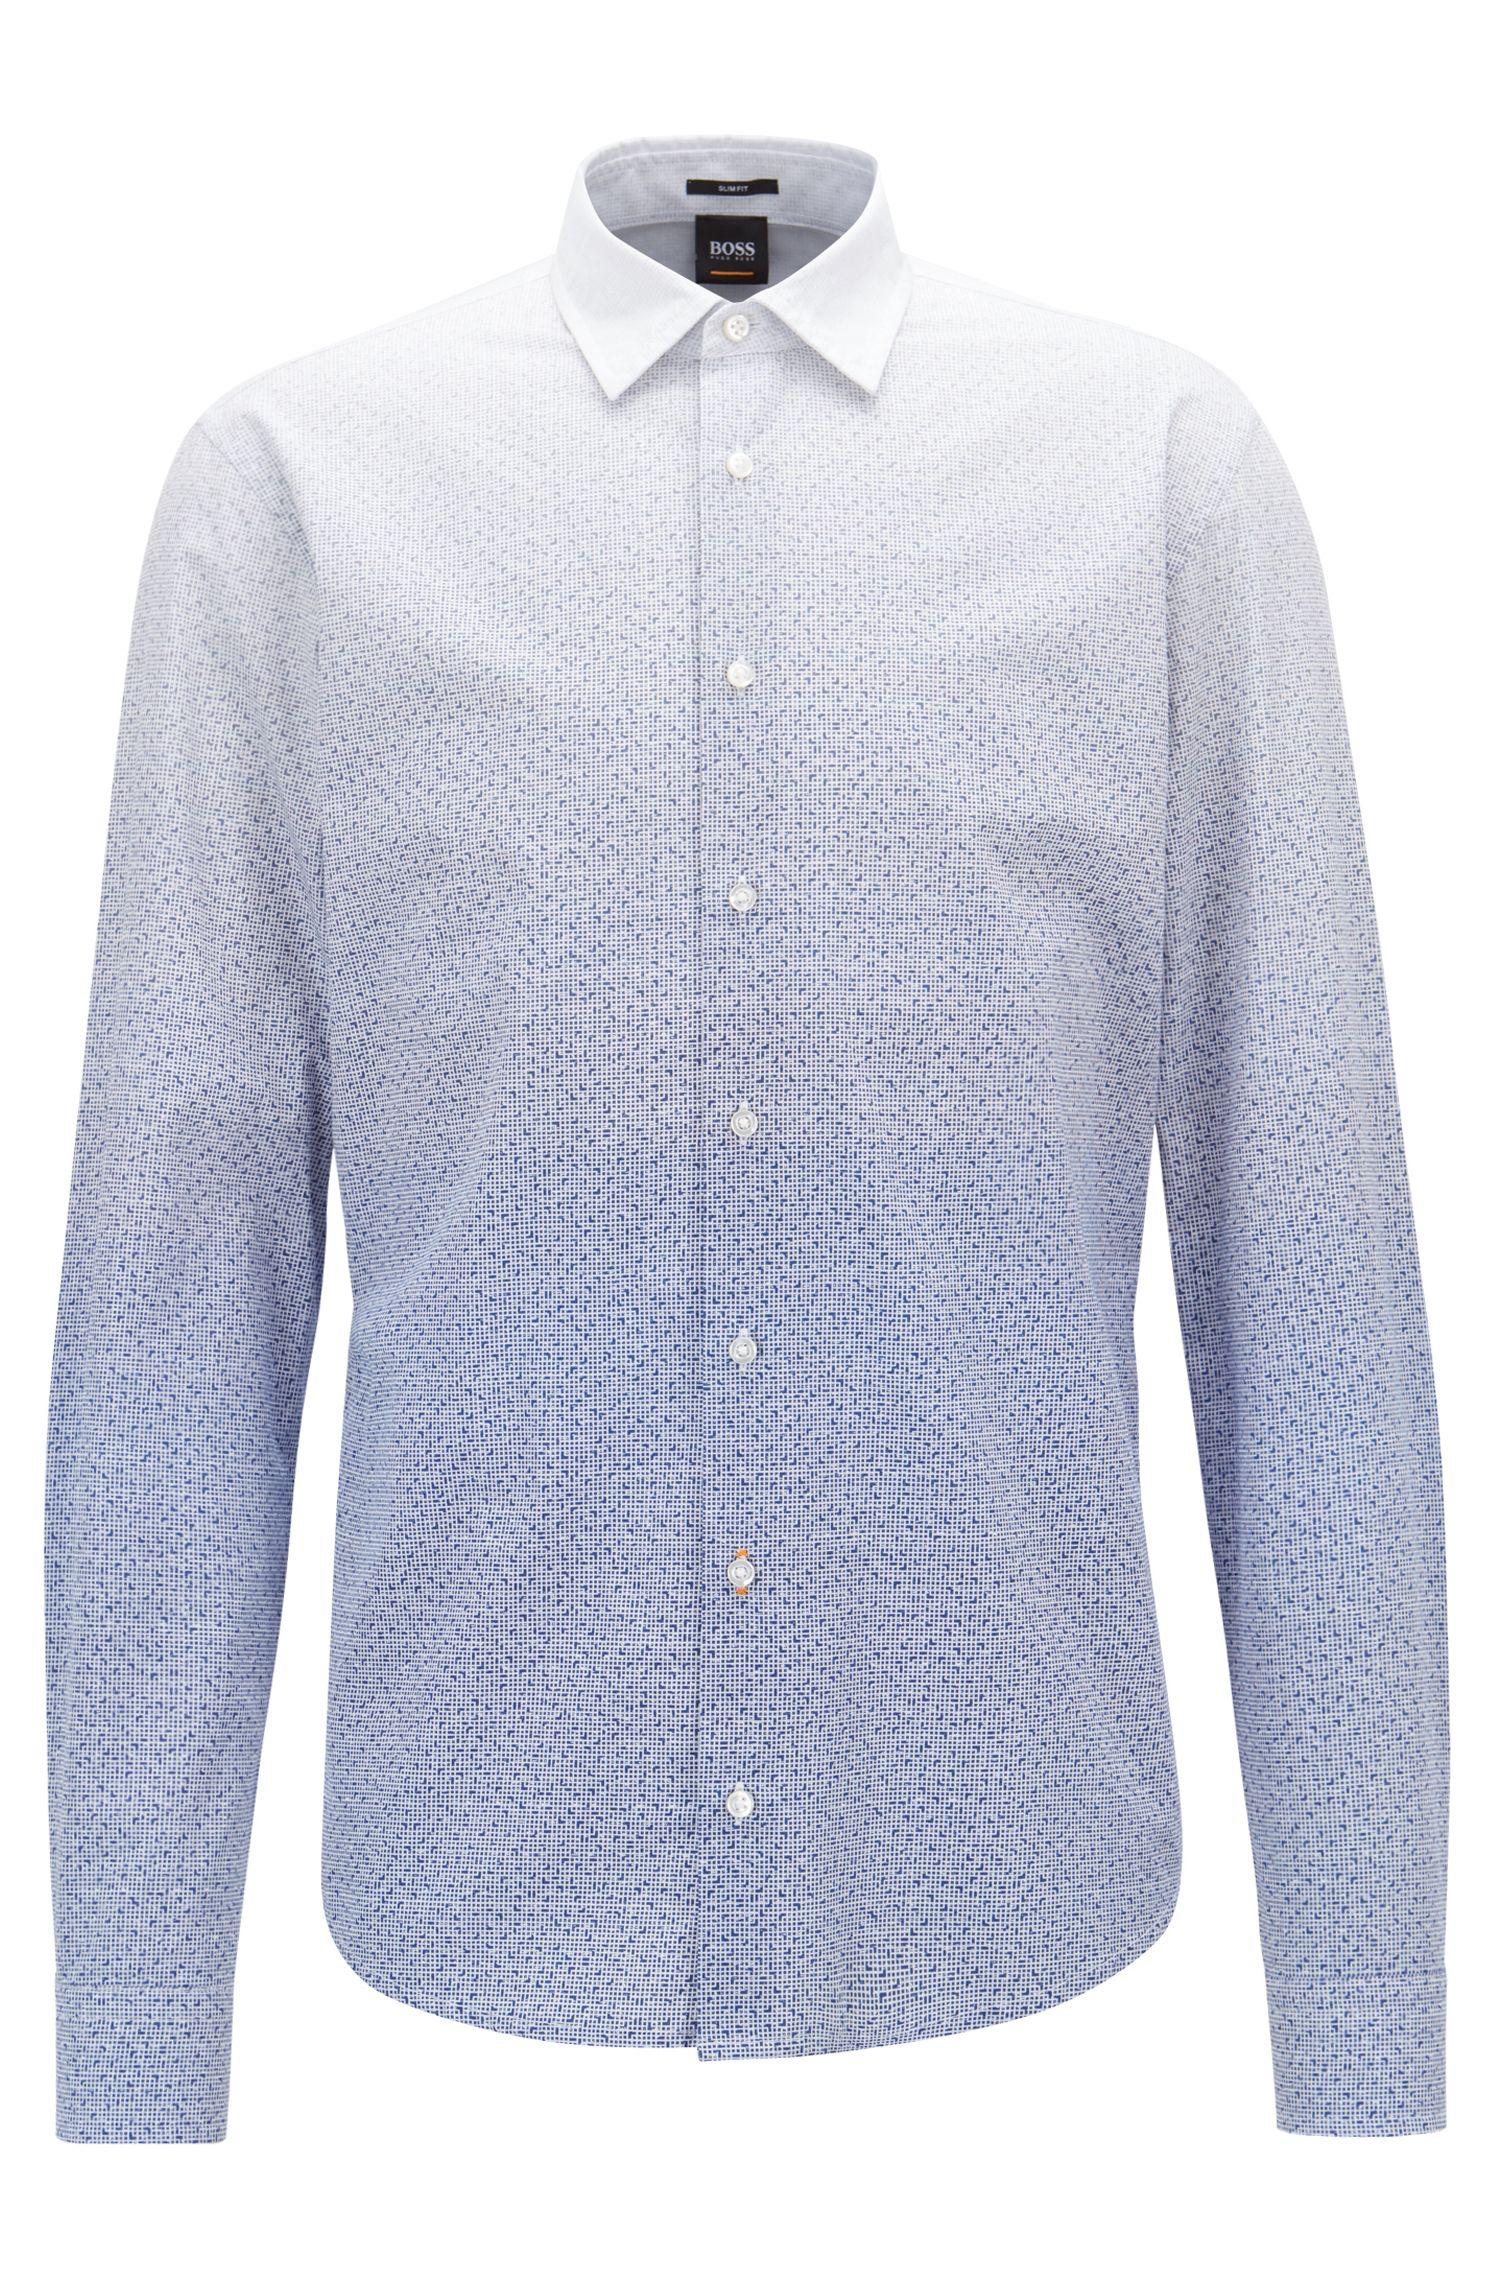 Slim-Fit Hemd aus Baumwolle mit Dégradé-Print, Dunkelblau